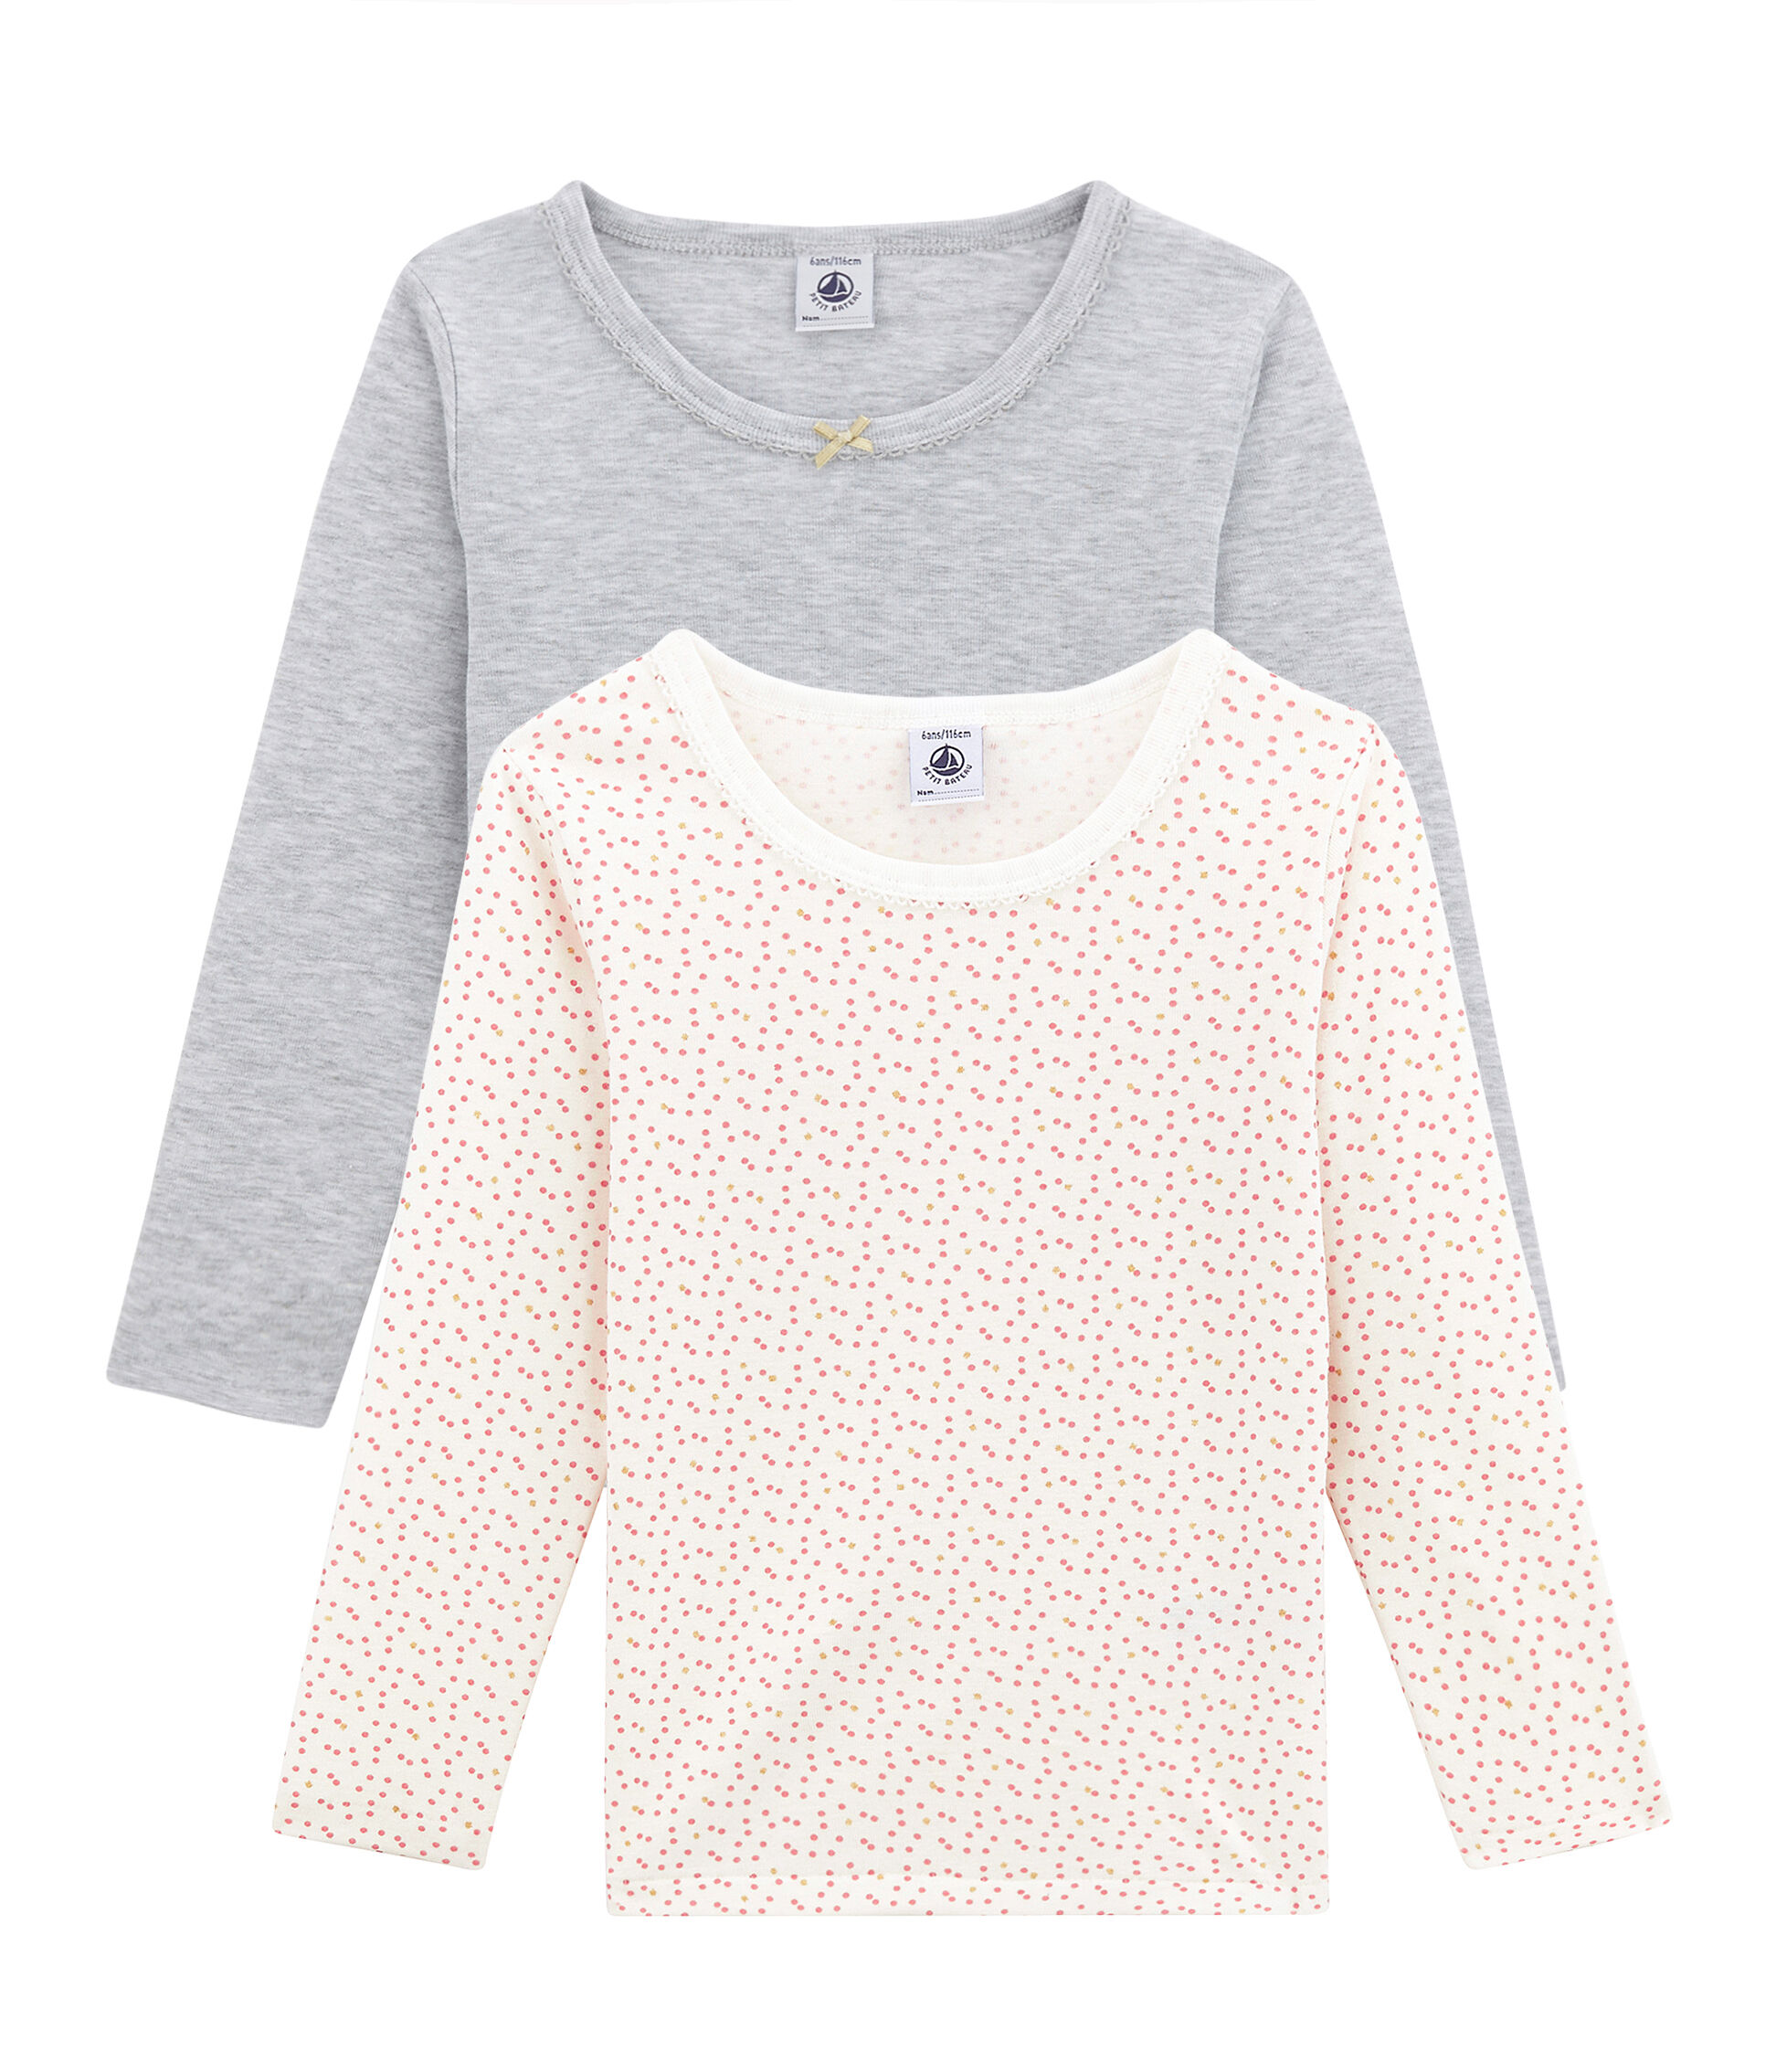 petit bateau mädchen langarmshirt tops, t-shirts & blusen